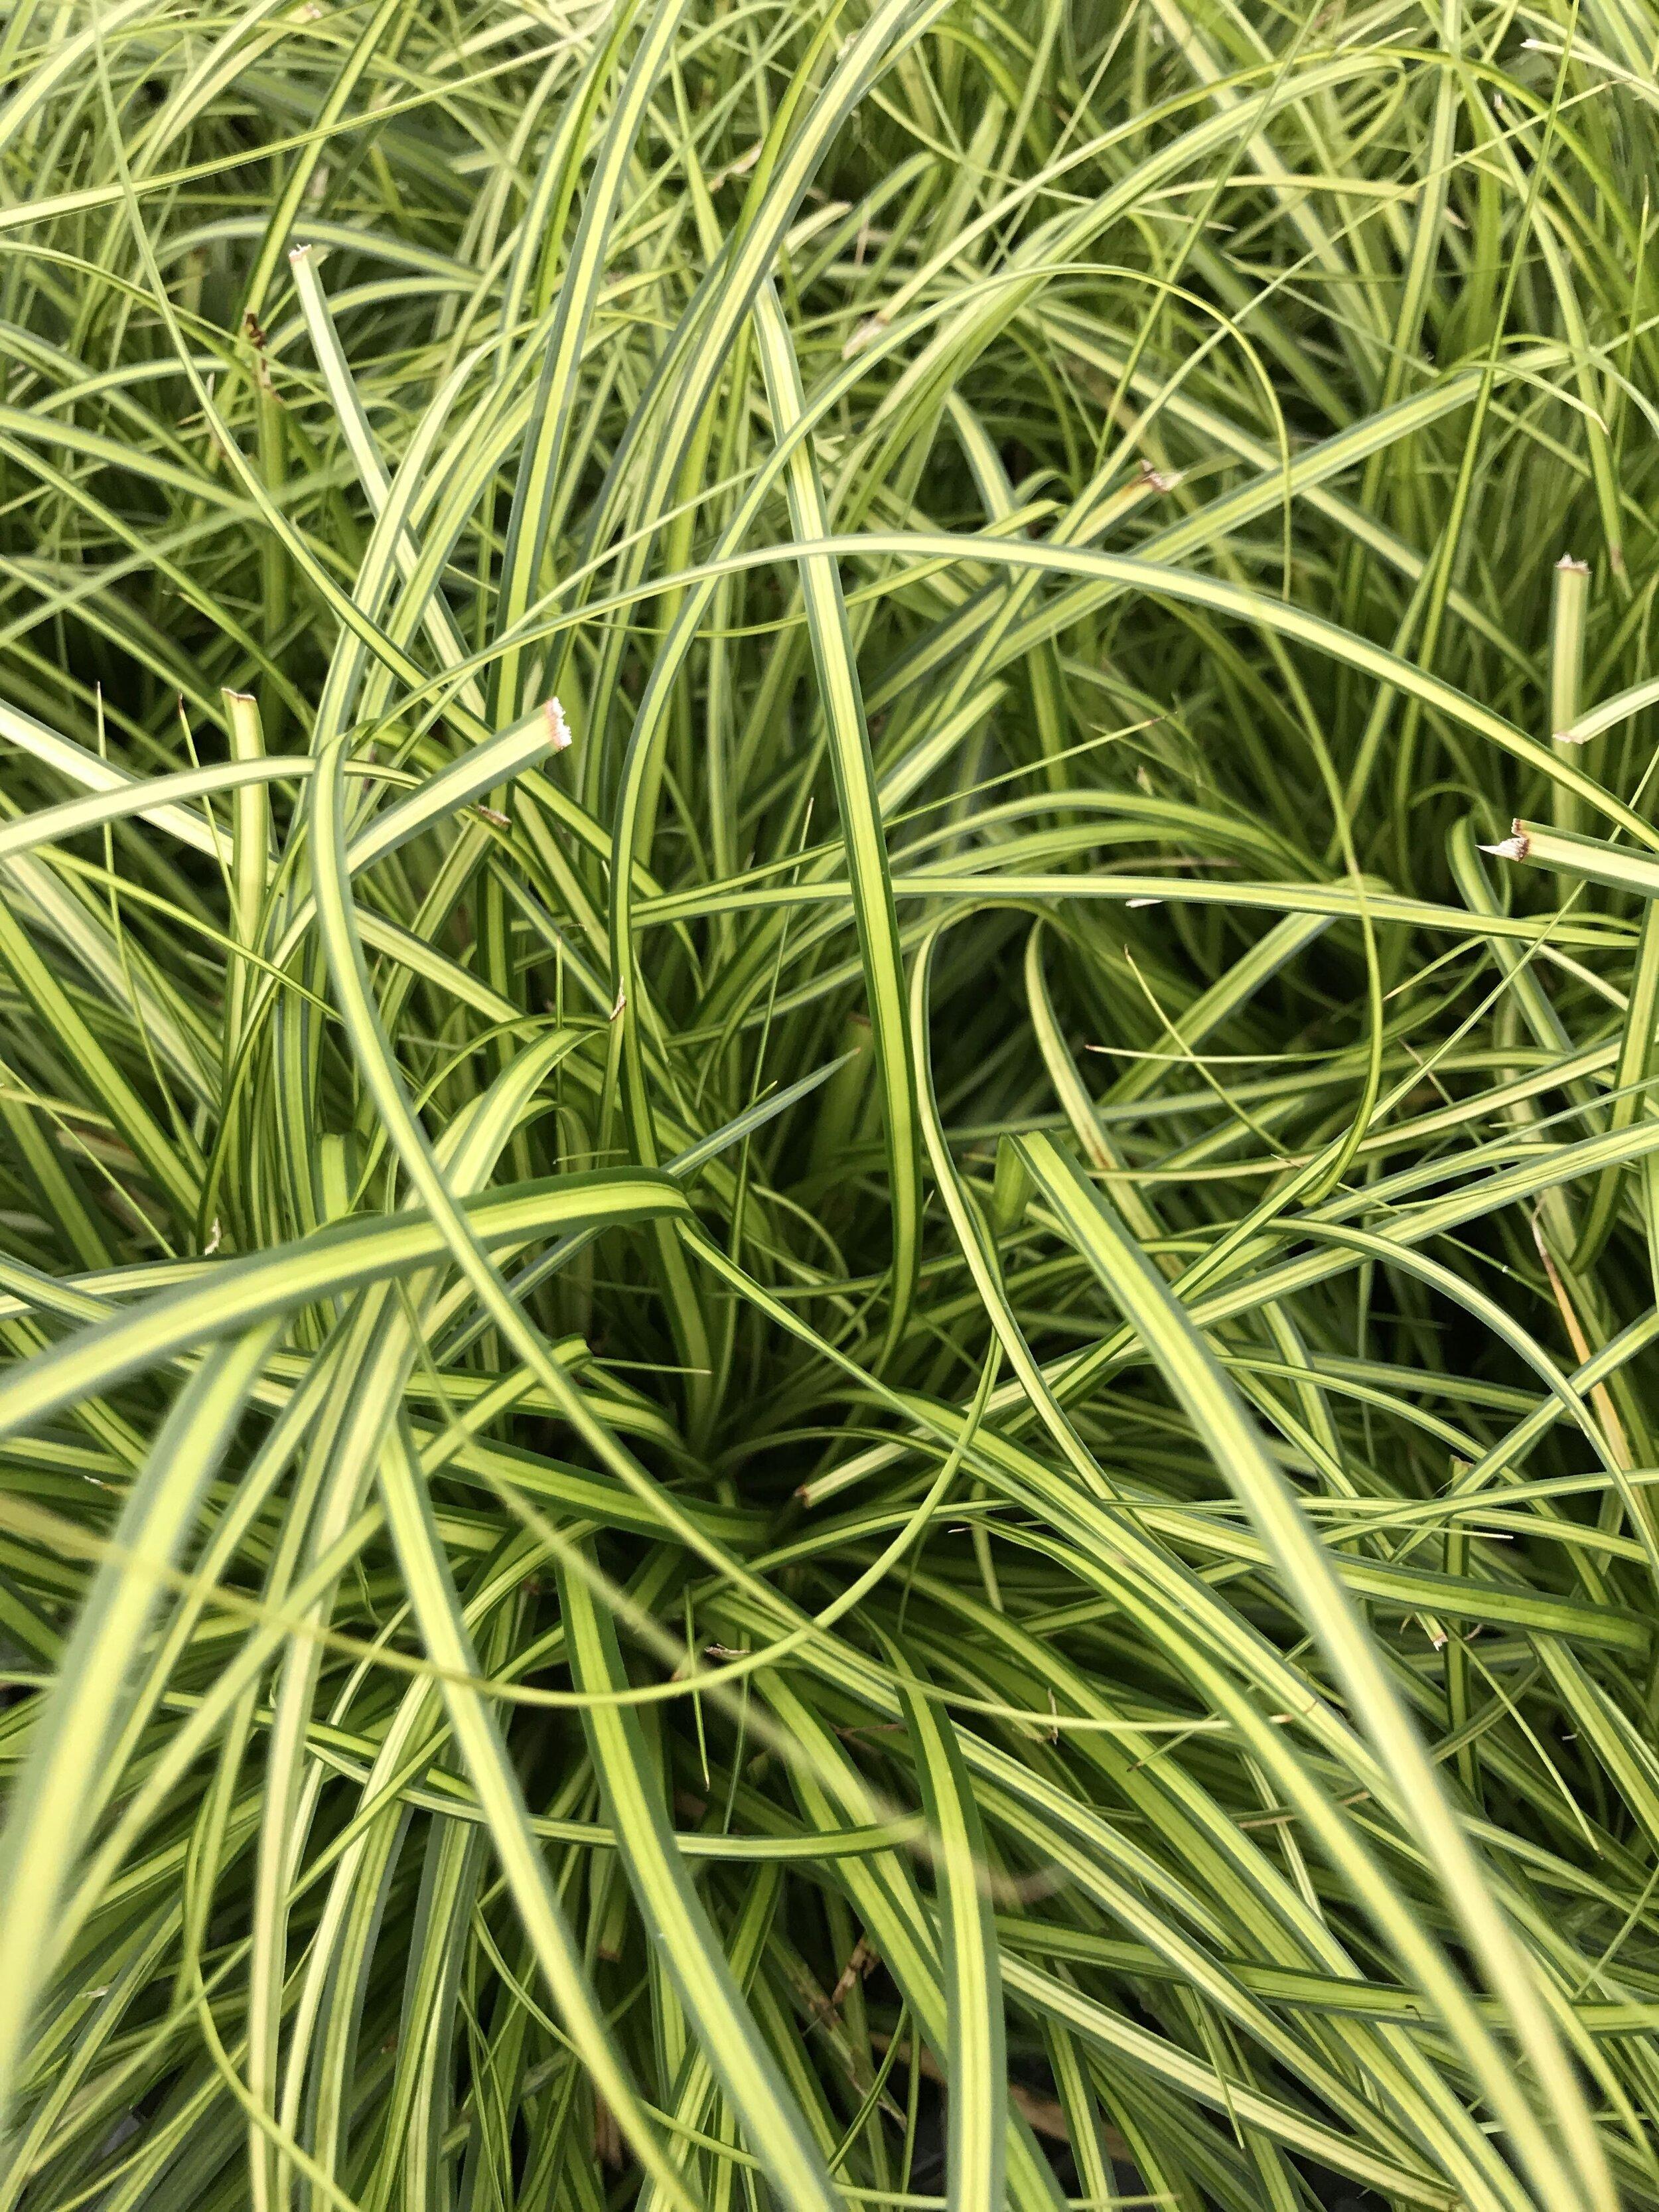 Carex oshimensis 'Eversheen' 1 gallon